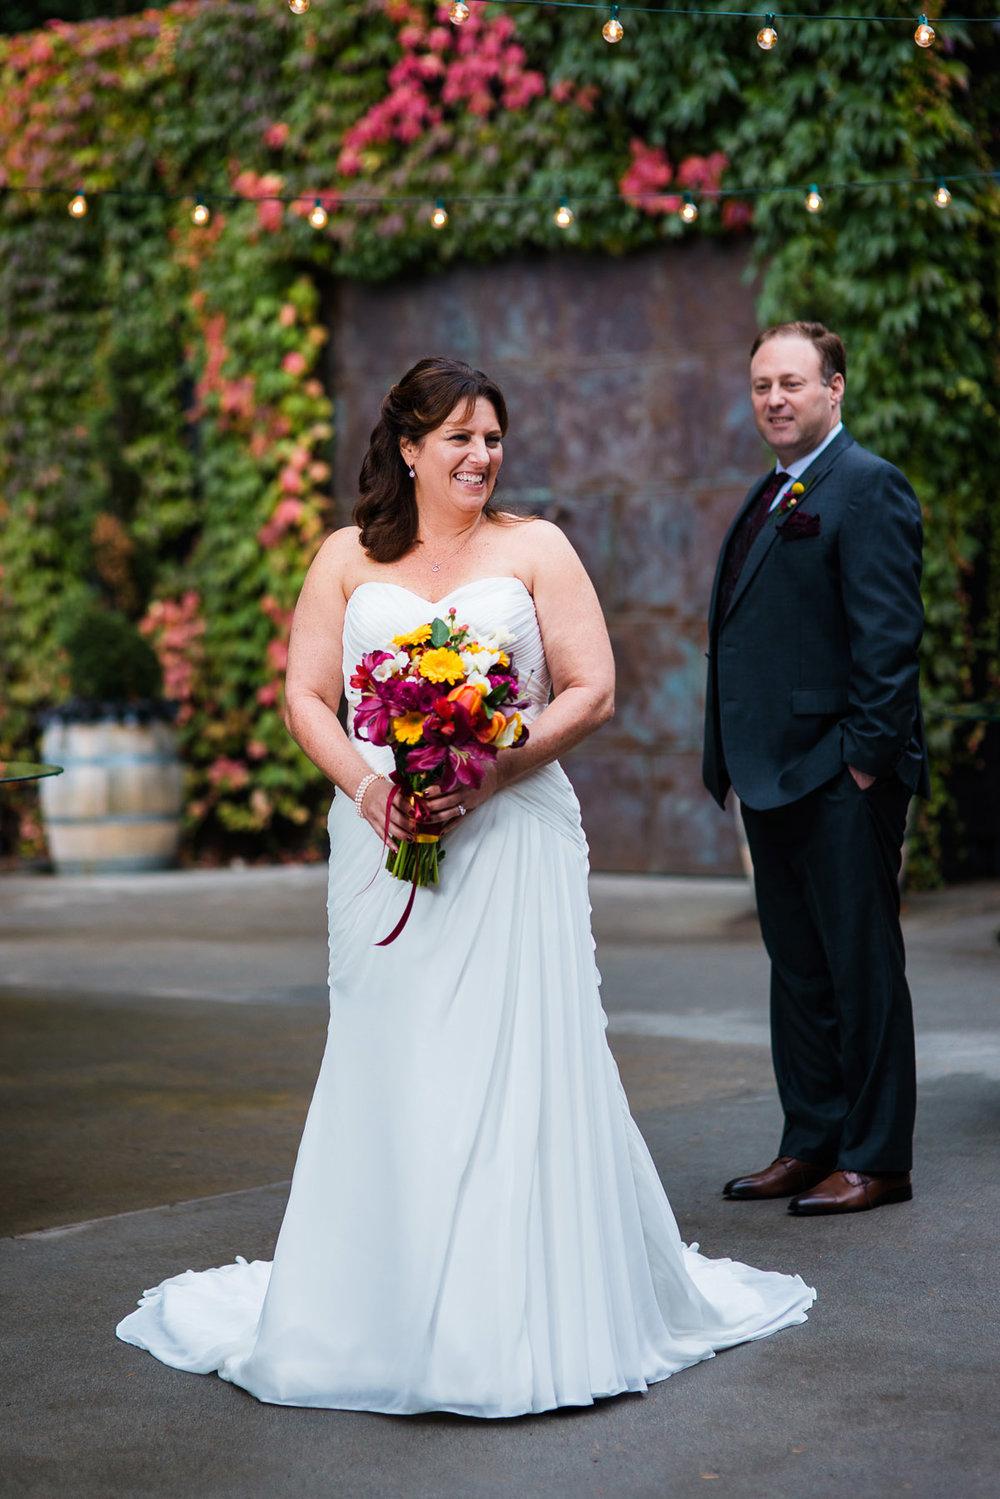 Fall JM Cellars Wedding | Washington Winery Wedding in October | www.rebeccaellison.com